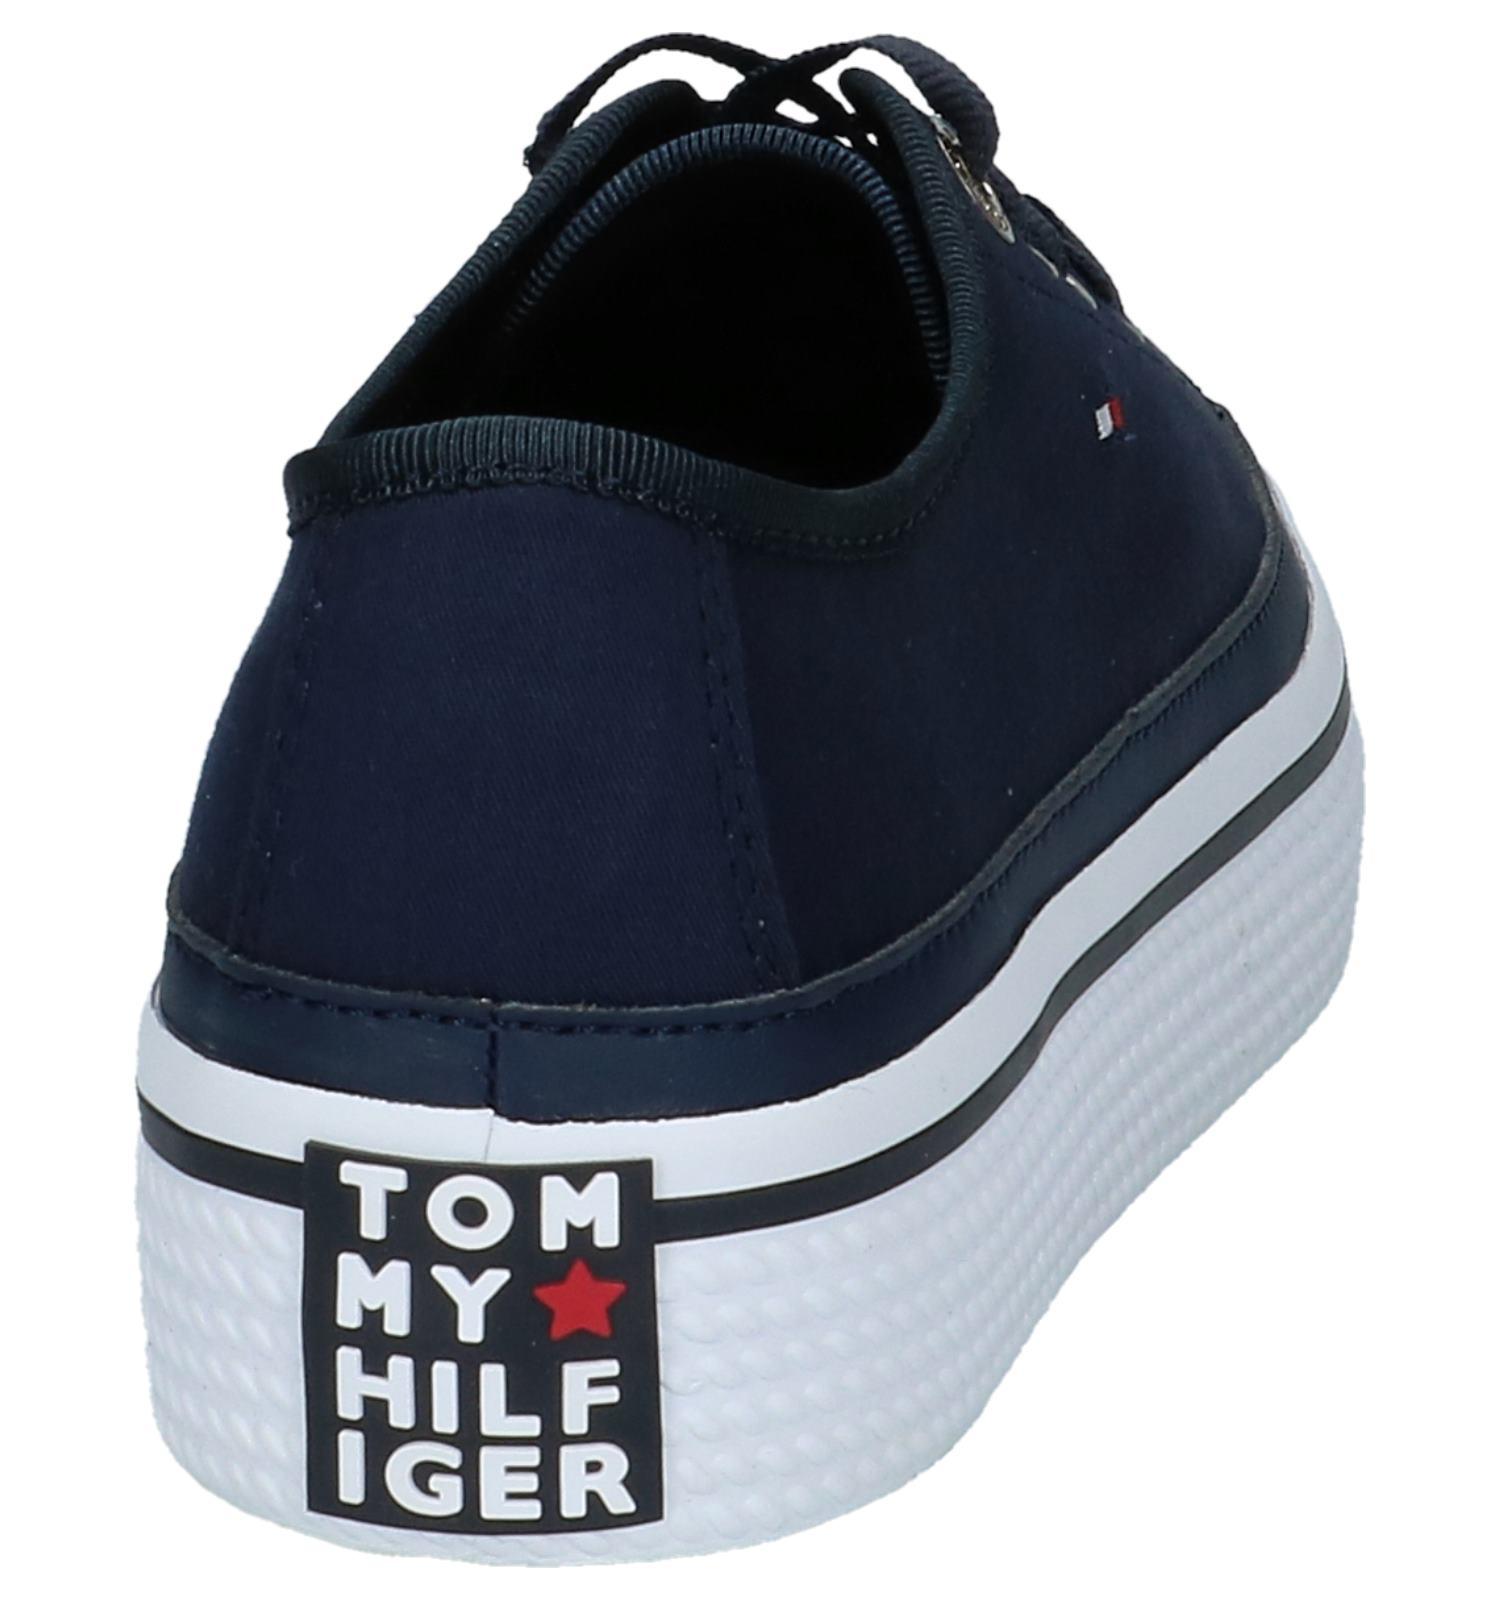 Hilfiger Coporate Lage Geklede Tommy Donkerblauwe Sneakers xsQtrdChB